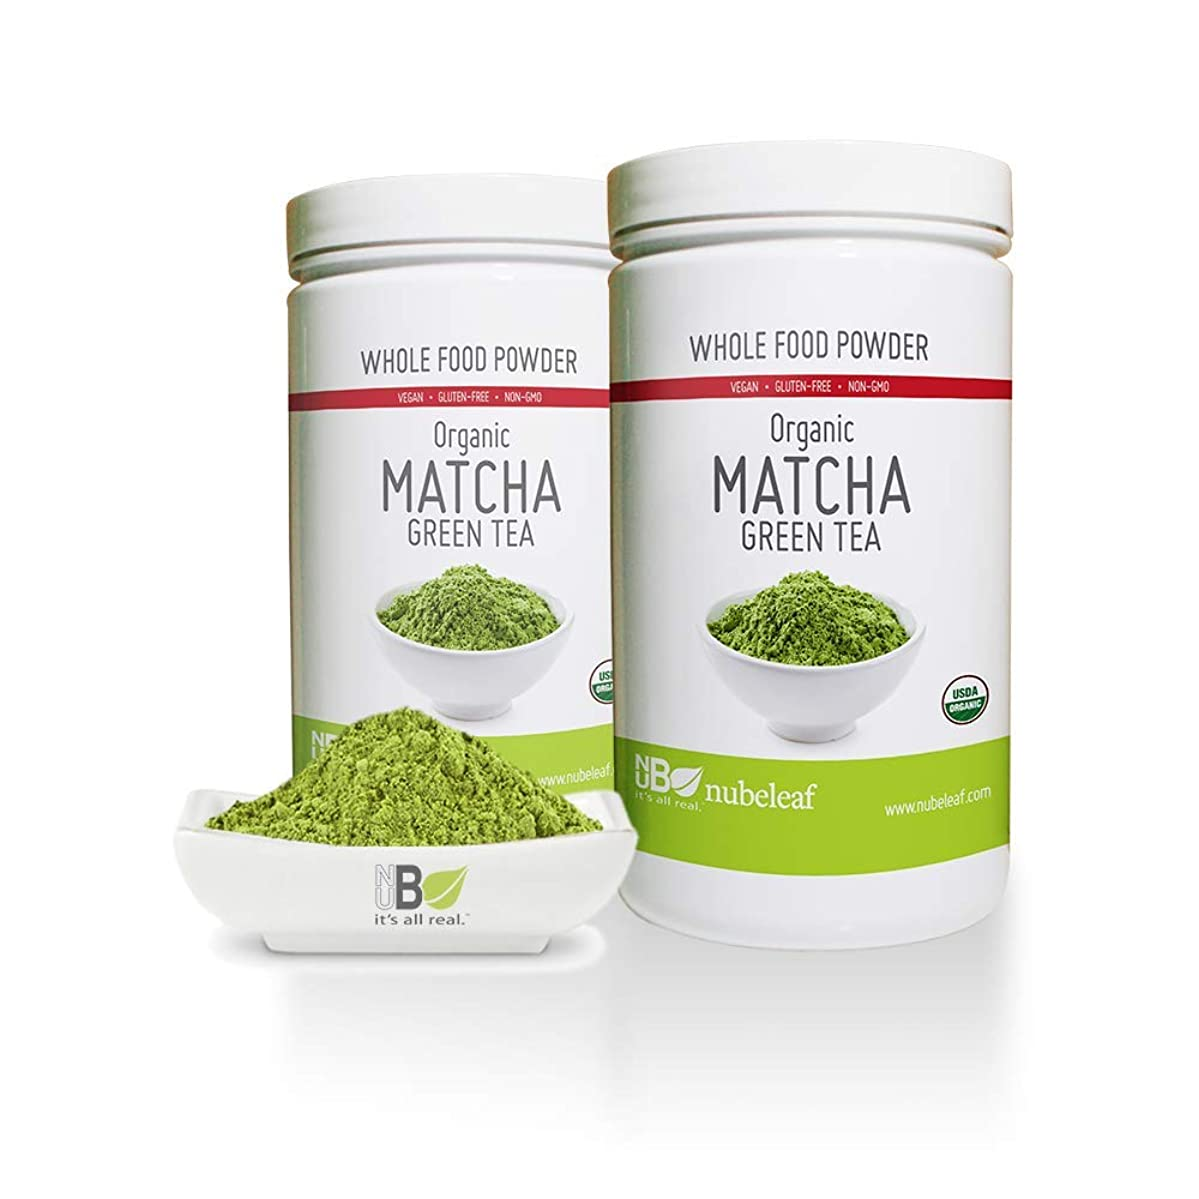 nubeleaf Organic Matcha Green Tea Powder- Premium Gourmet Matcha Green Tea Powder - Lattes, Smoothies, Baking, Recipes - No Additives, No Sugar - Antioxidants, Superfood, Energy